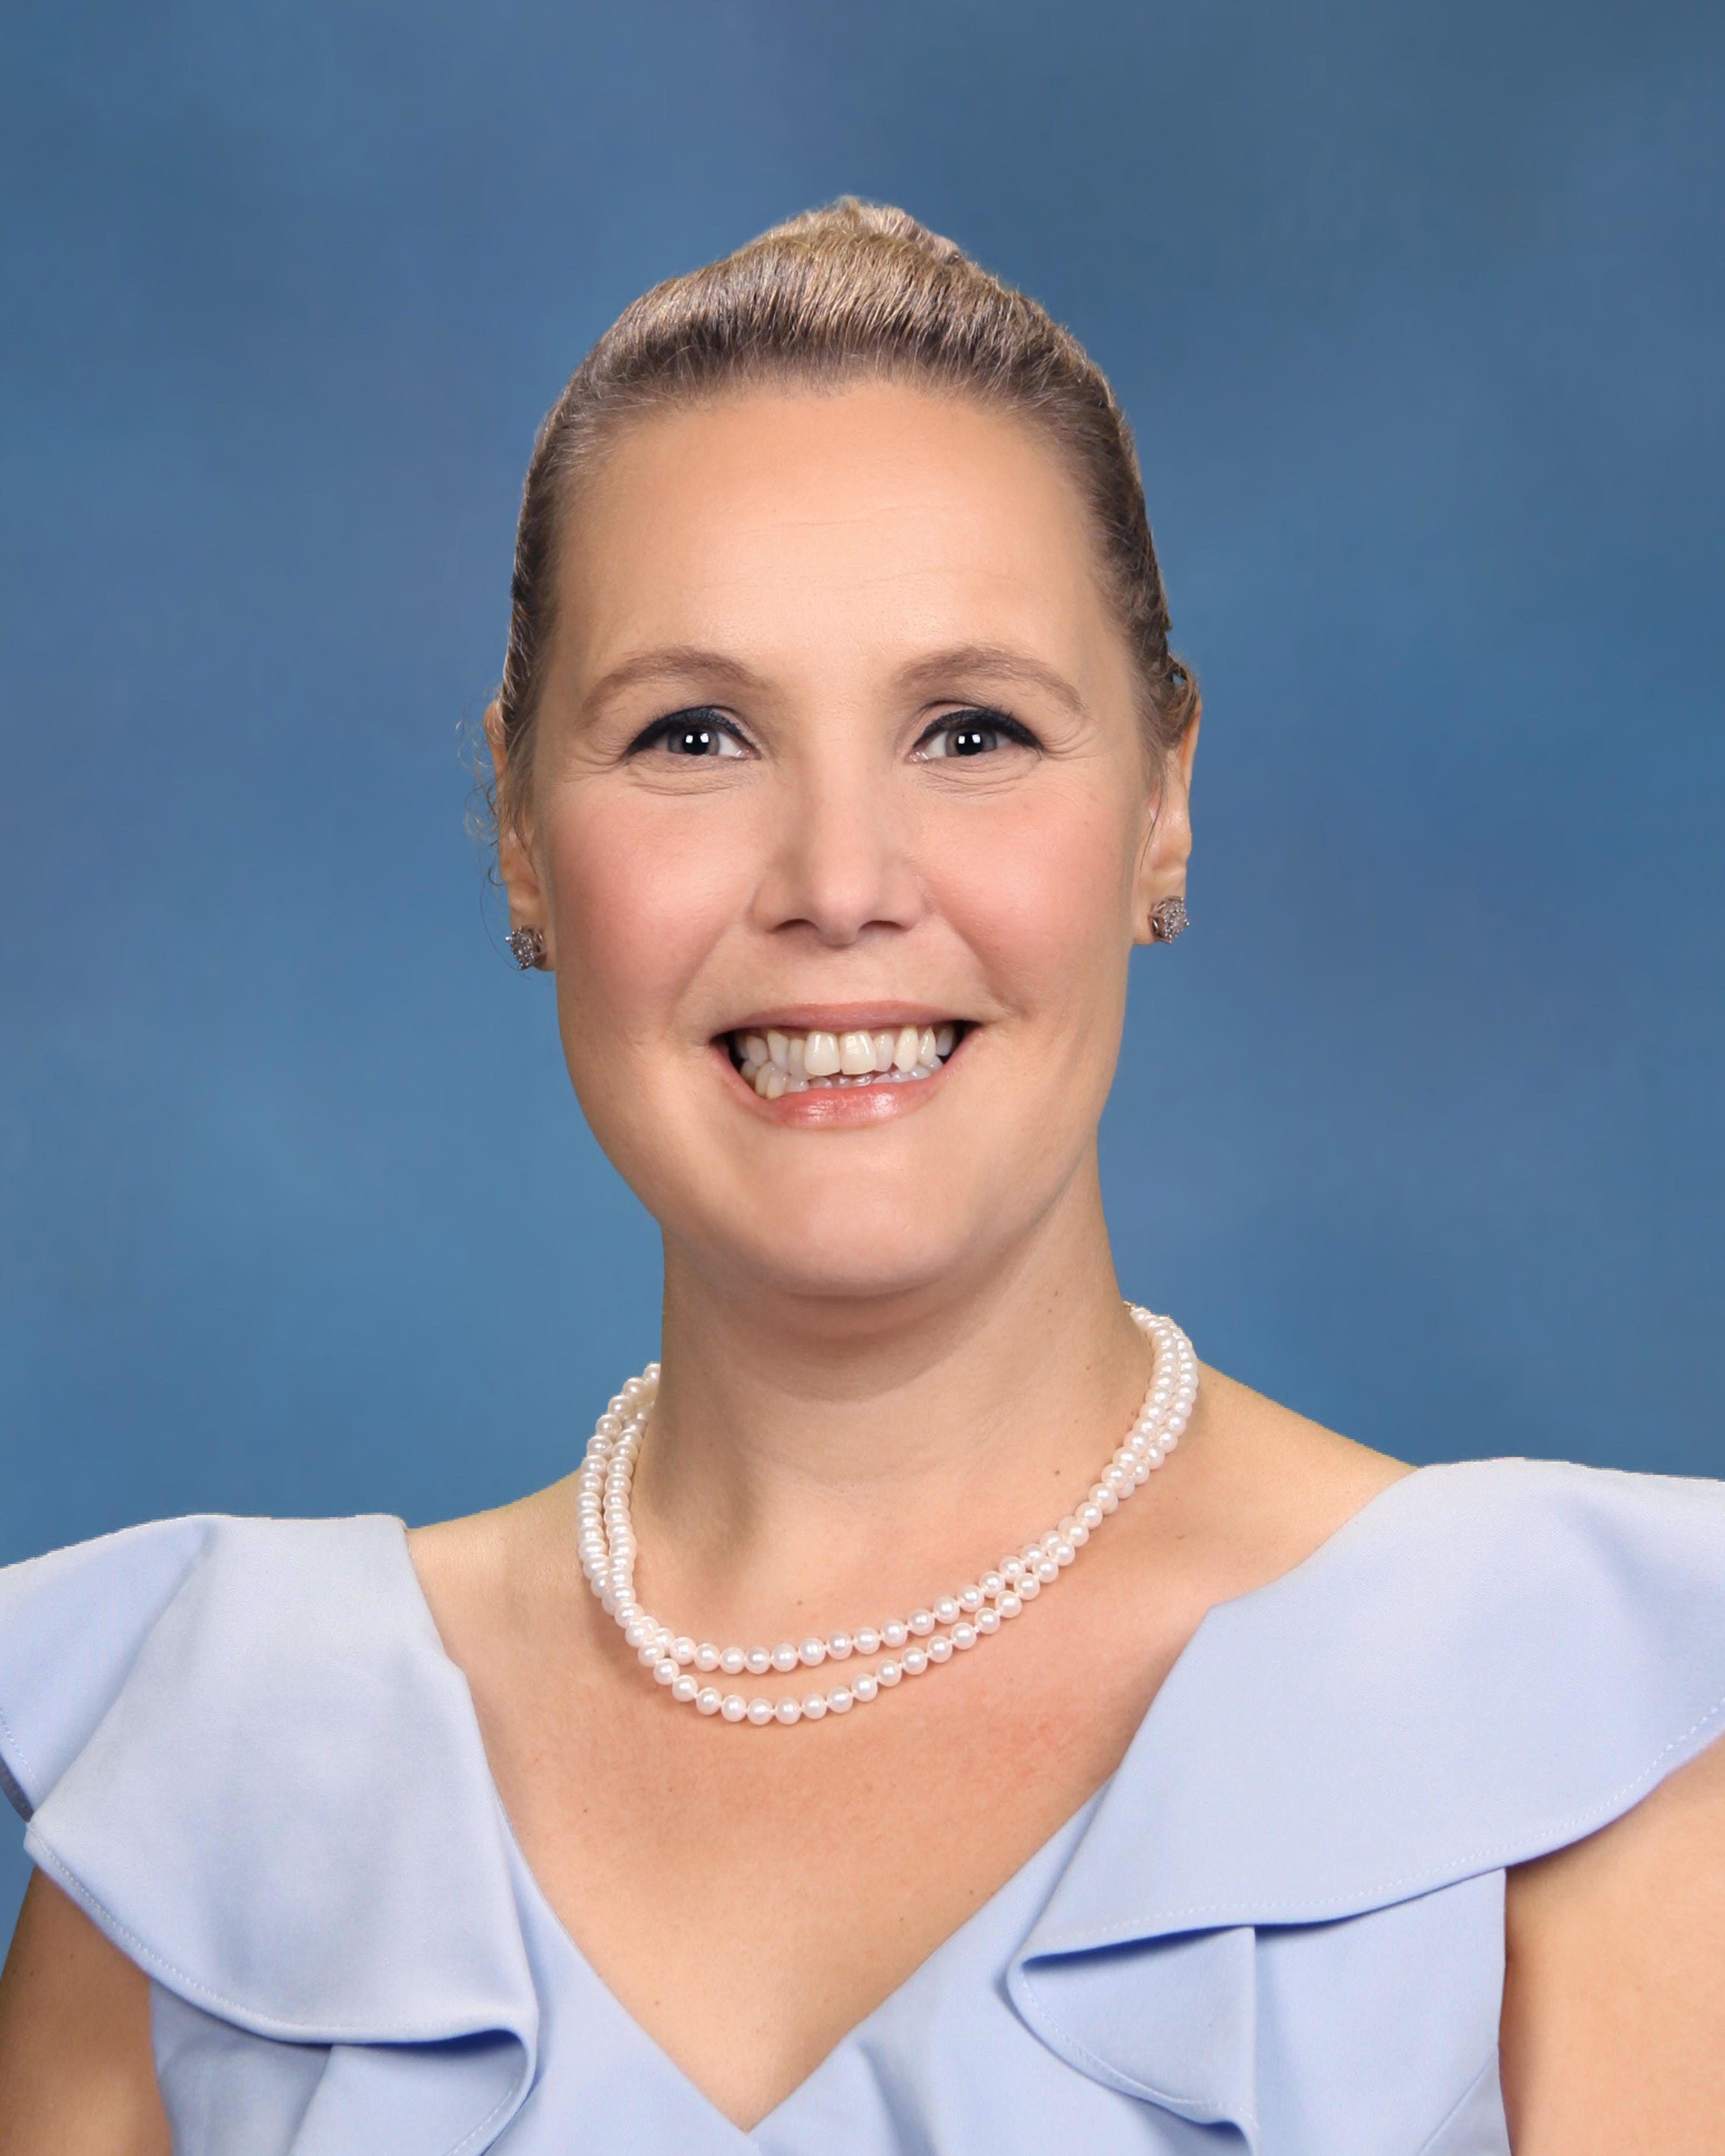 Leslie Wilkinson - Garden City Elementary